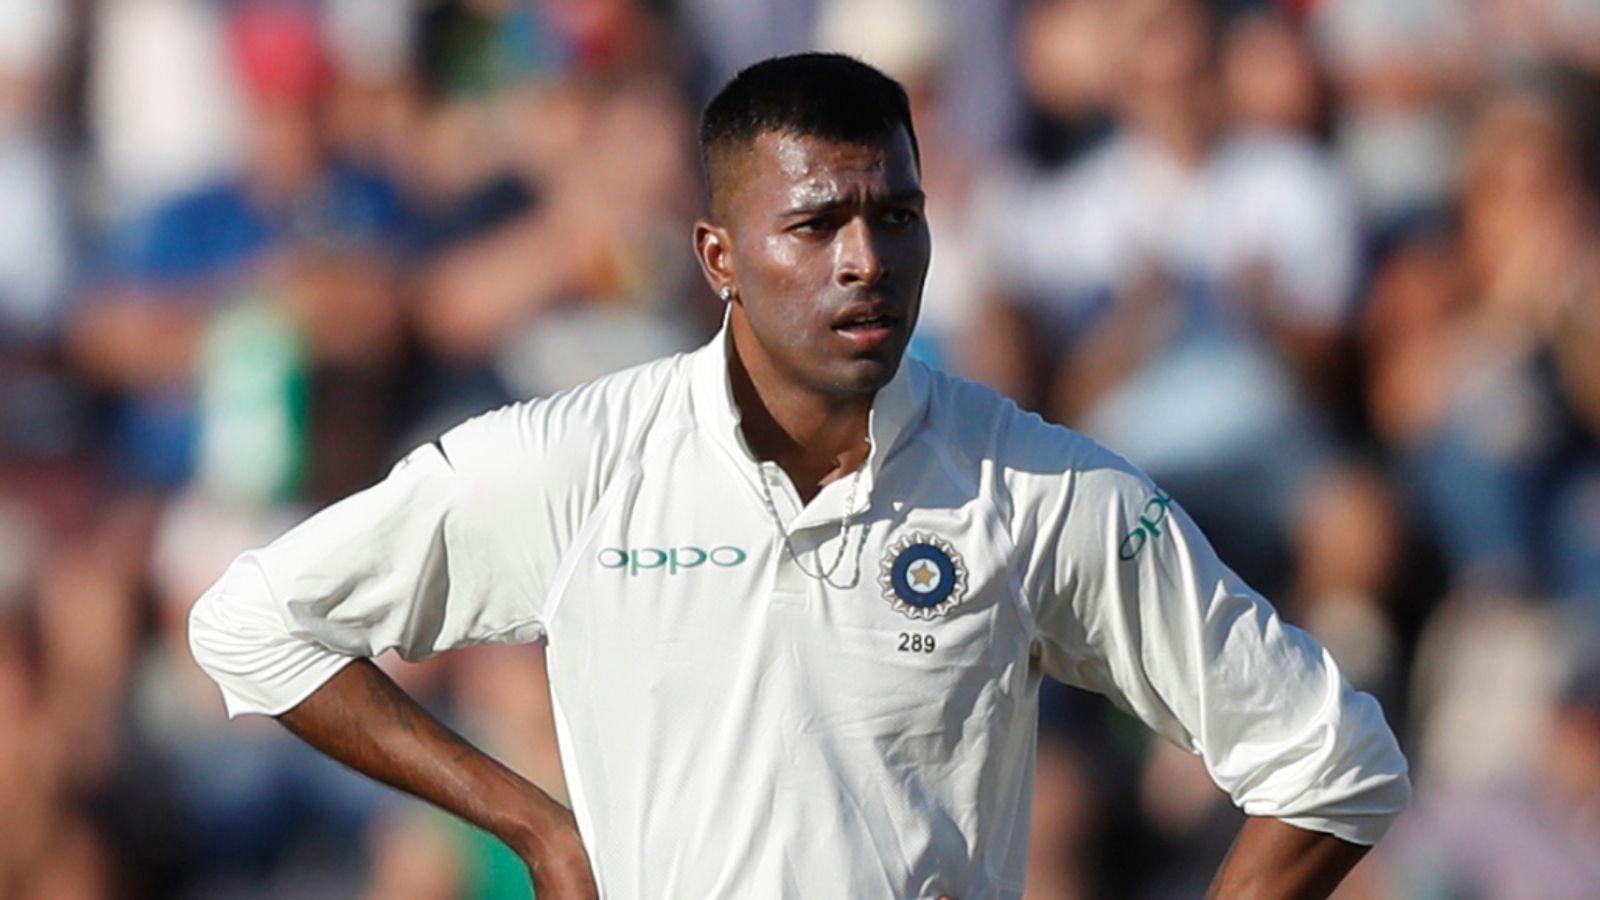 India squad for England Test tour: Hardik Pandya left out of 20-man group